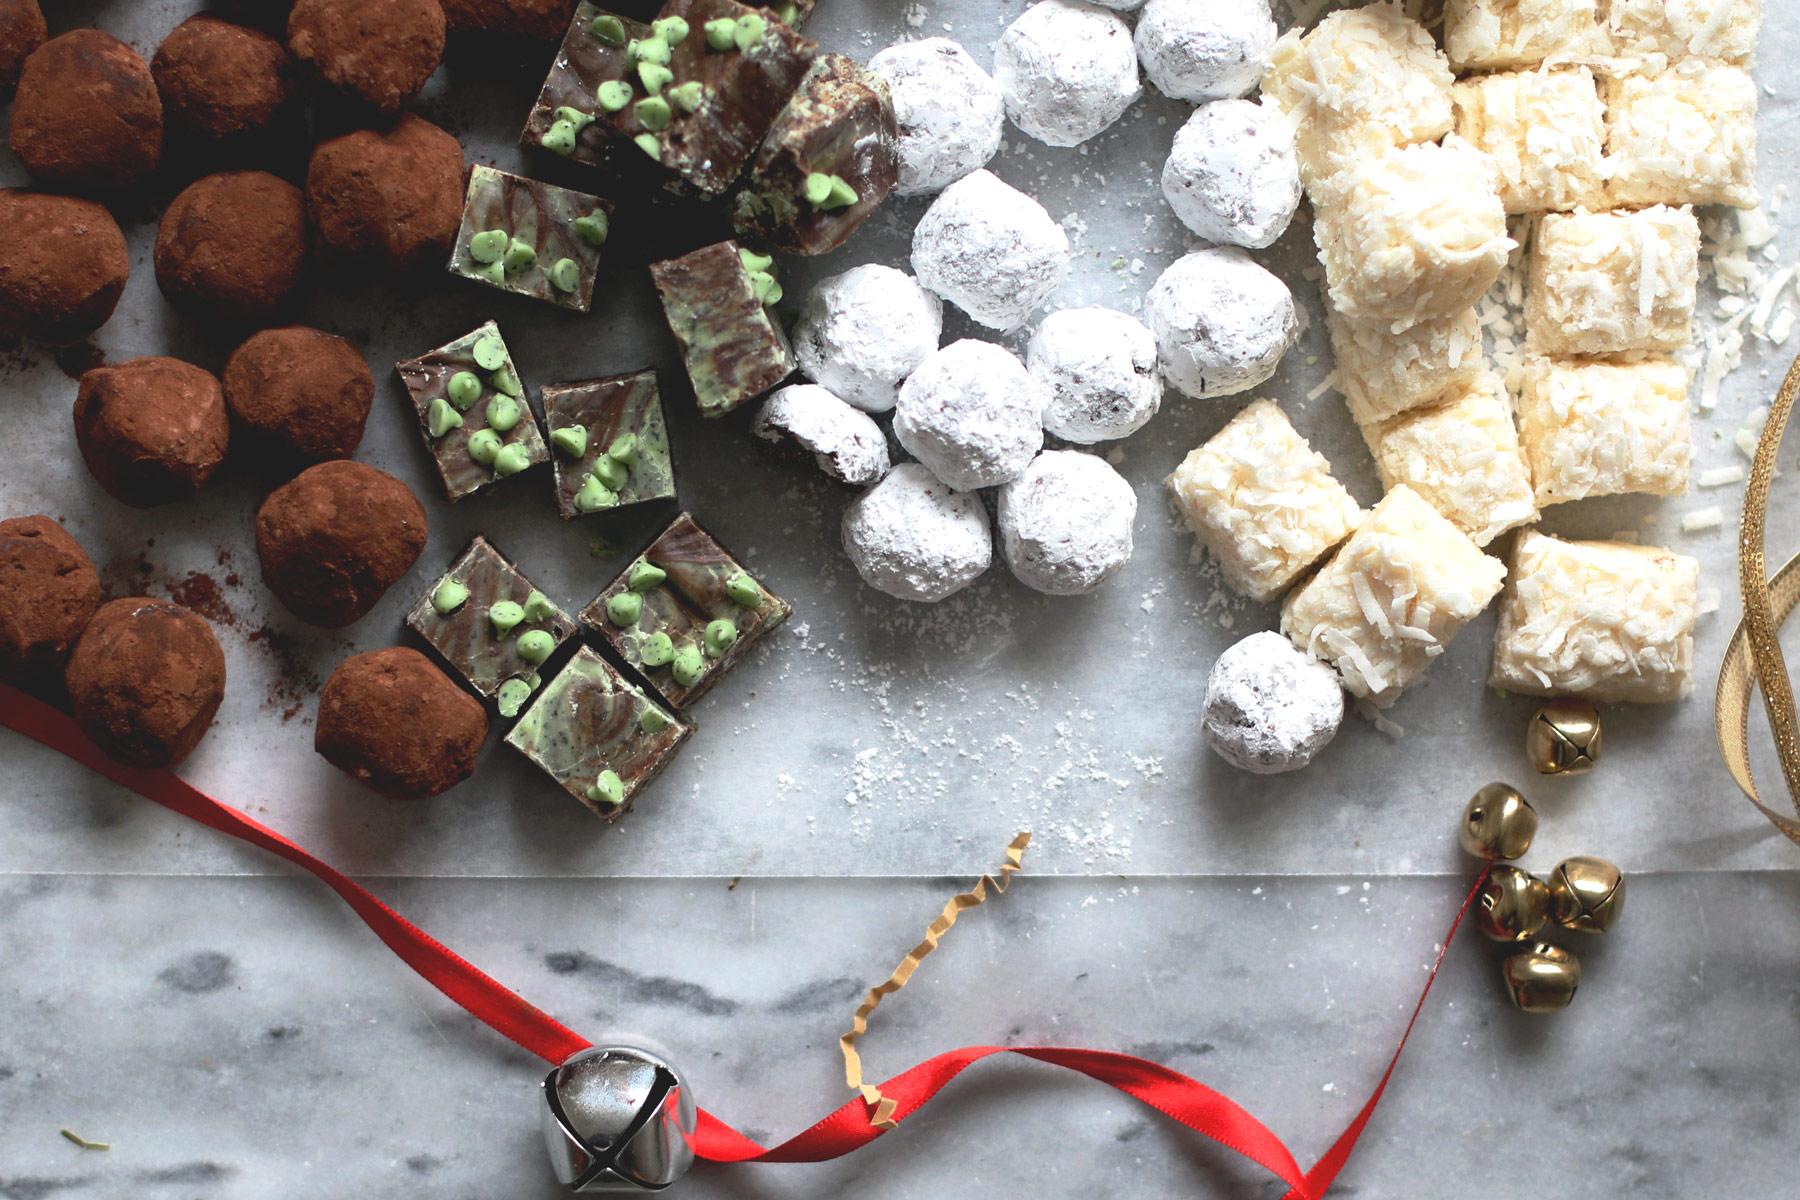 Edible Gift Ideas: Truffles & Fudge